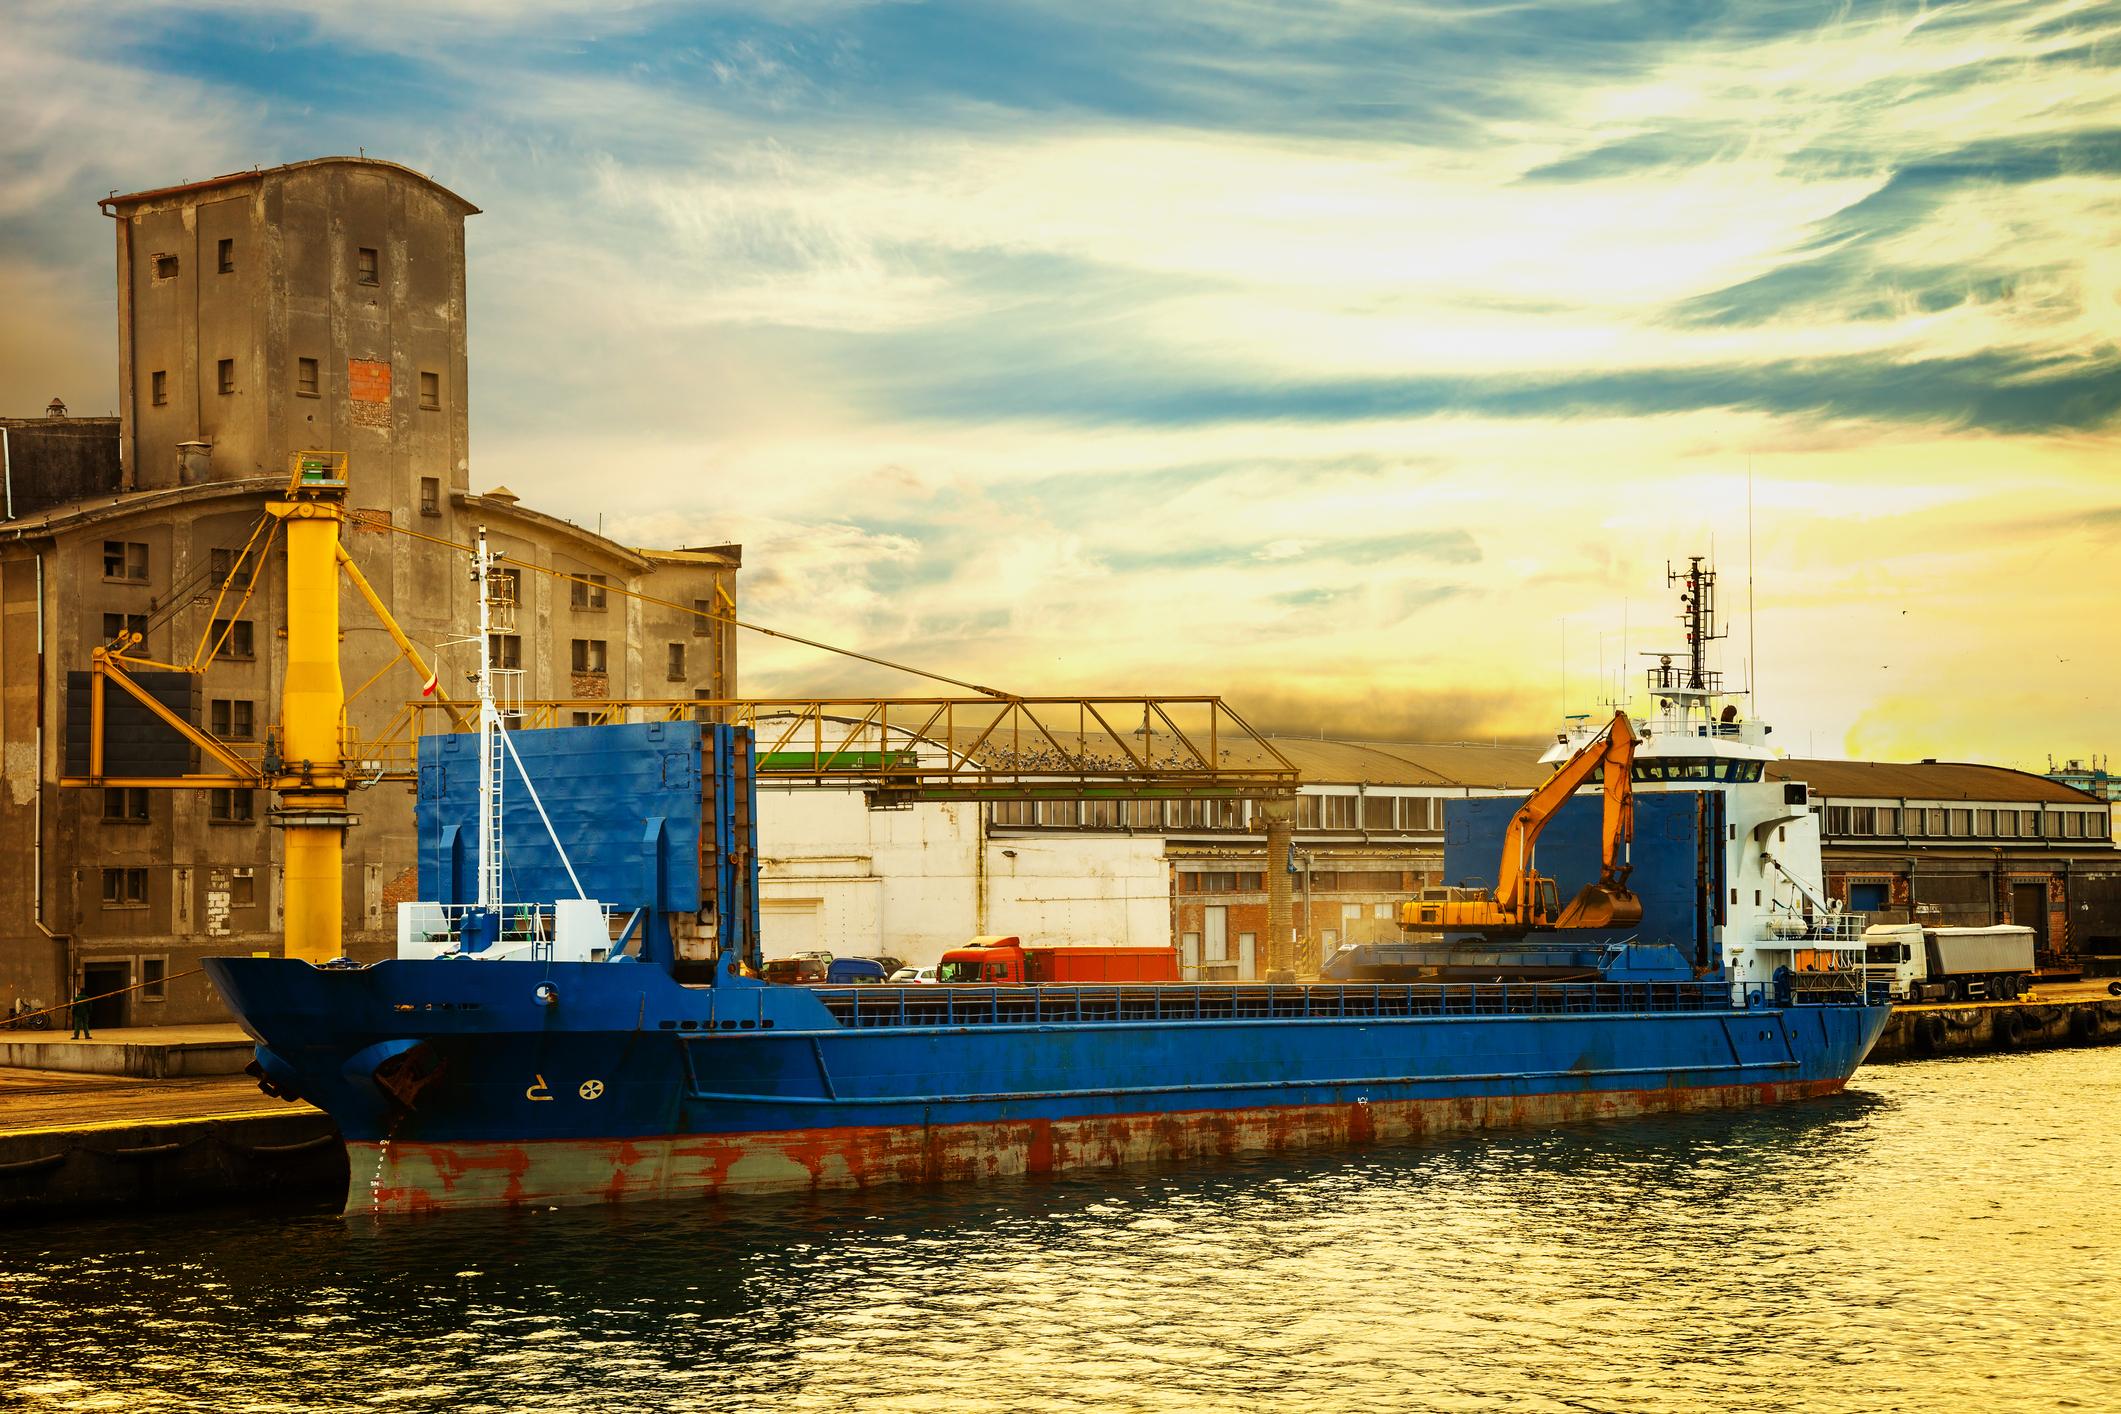 Grain Ship being loaded in Port.